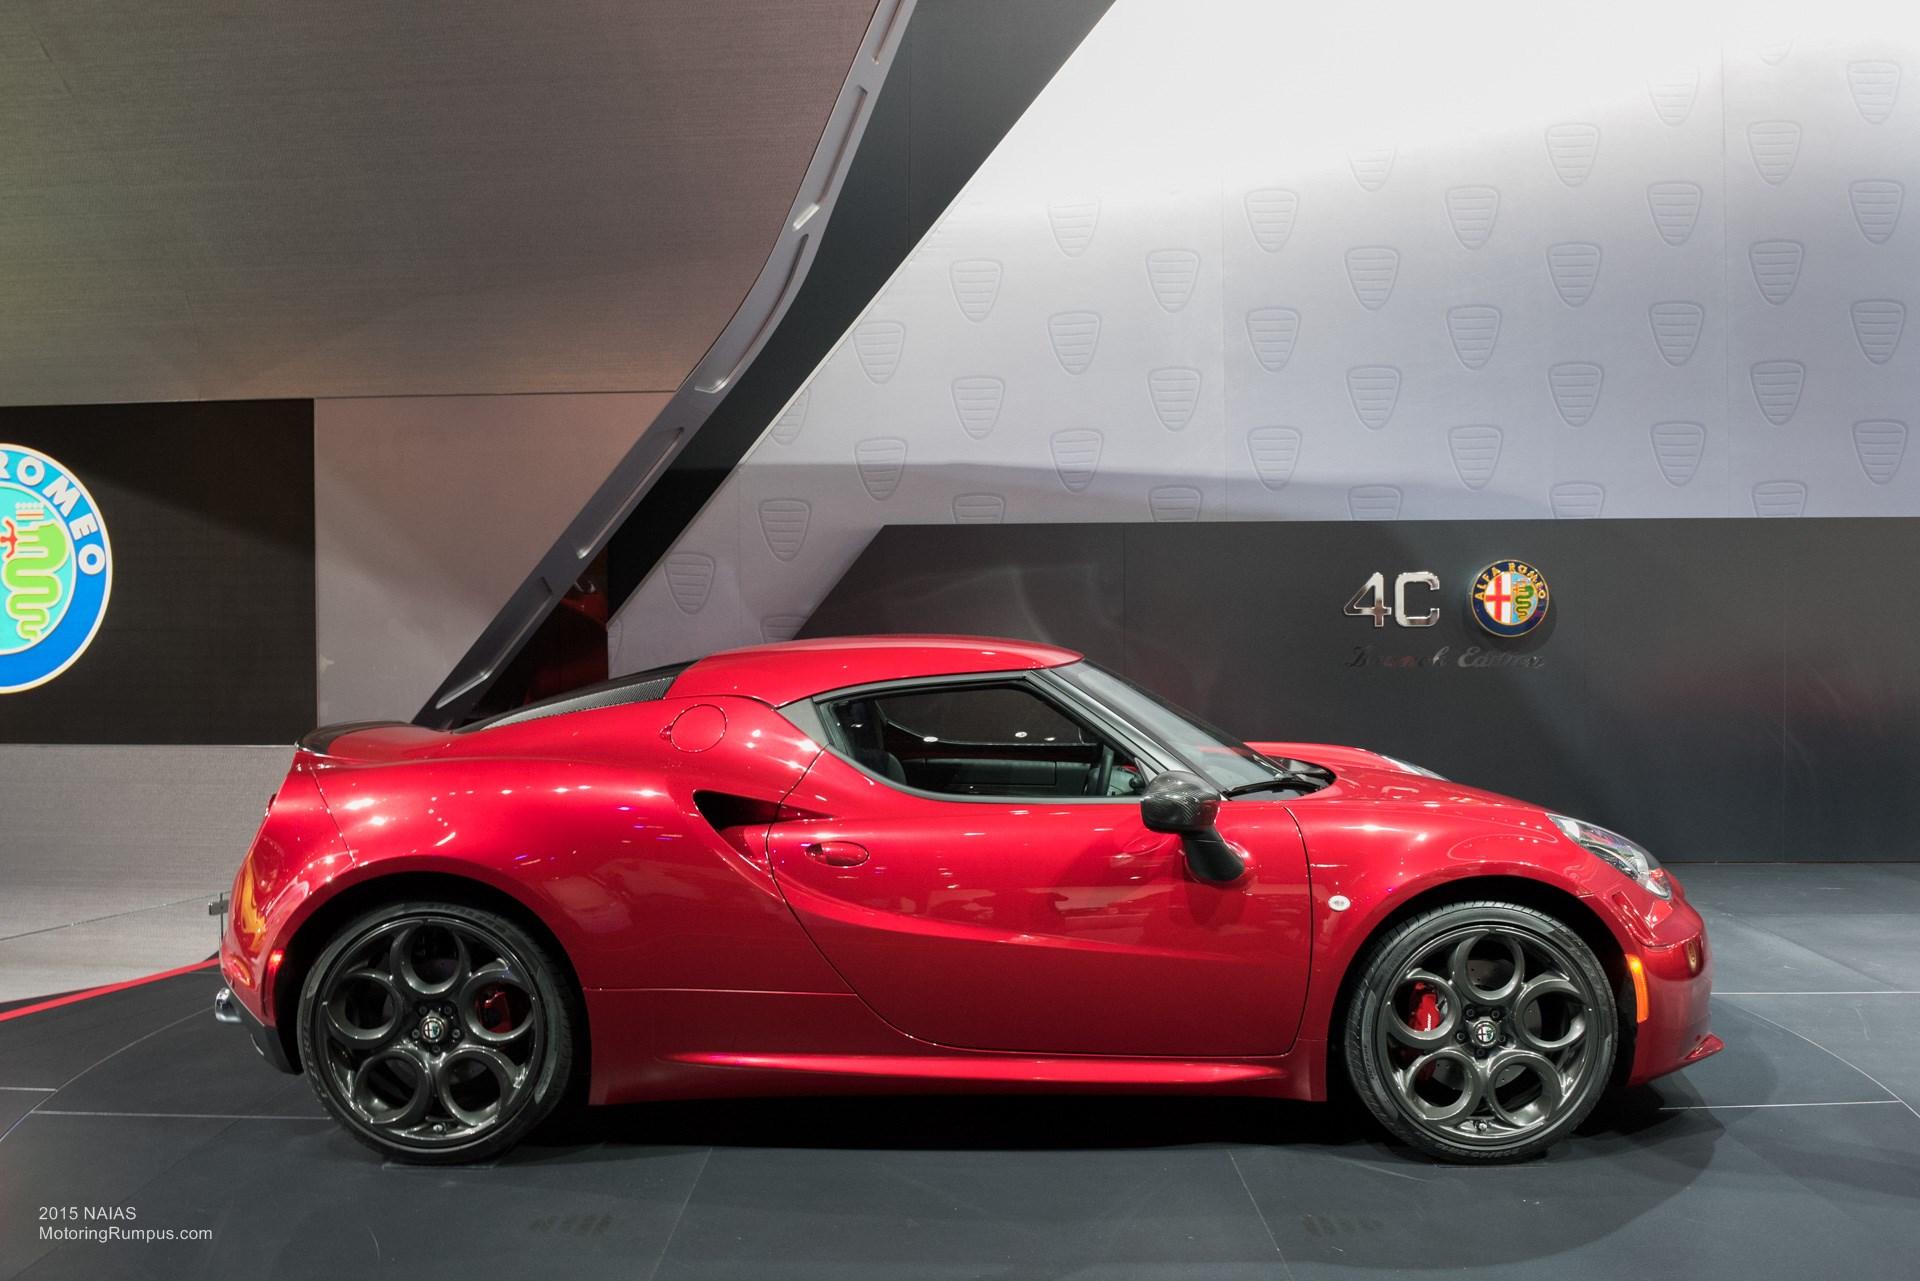 2015 NAIAS Alfa Romeo 4C Side